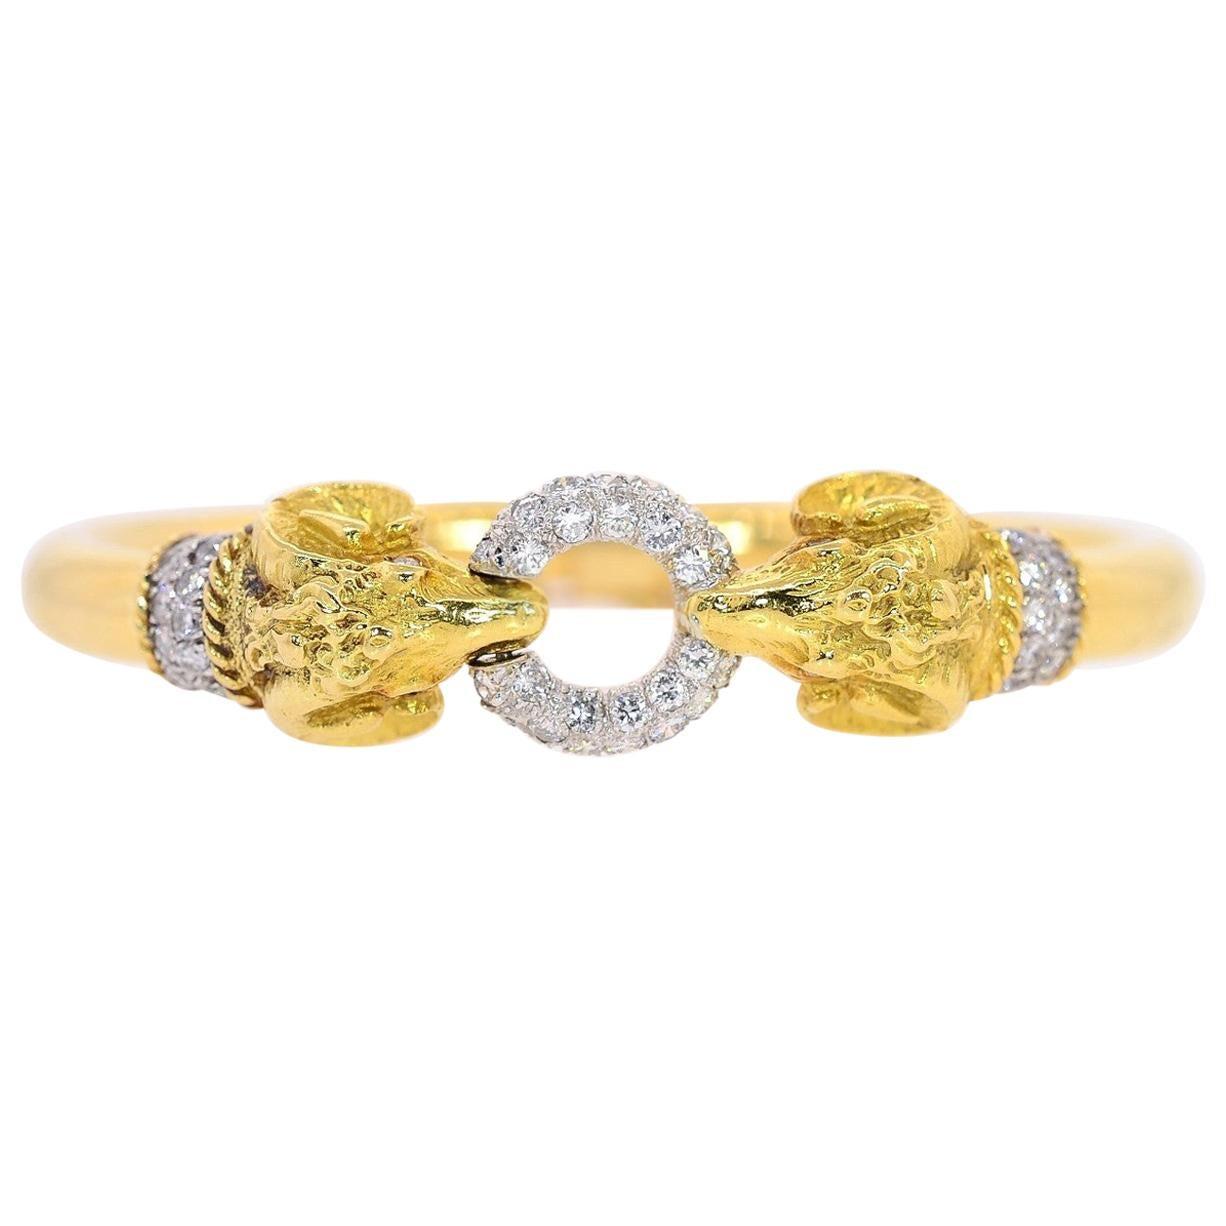 Rams Head Diamond and Gold Bangle/Bracelet